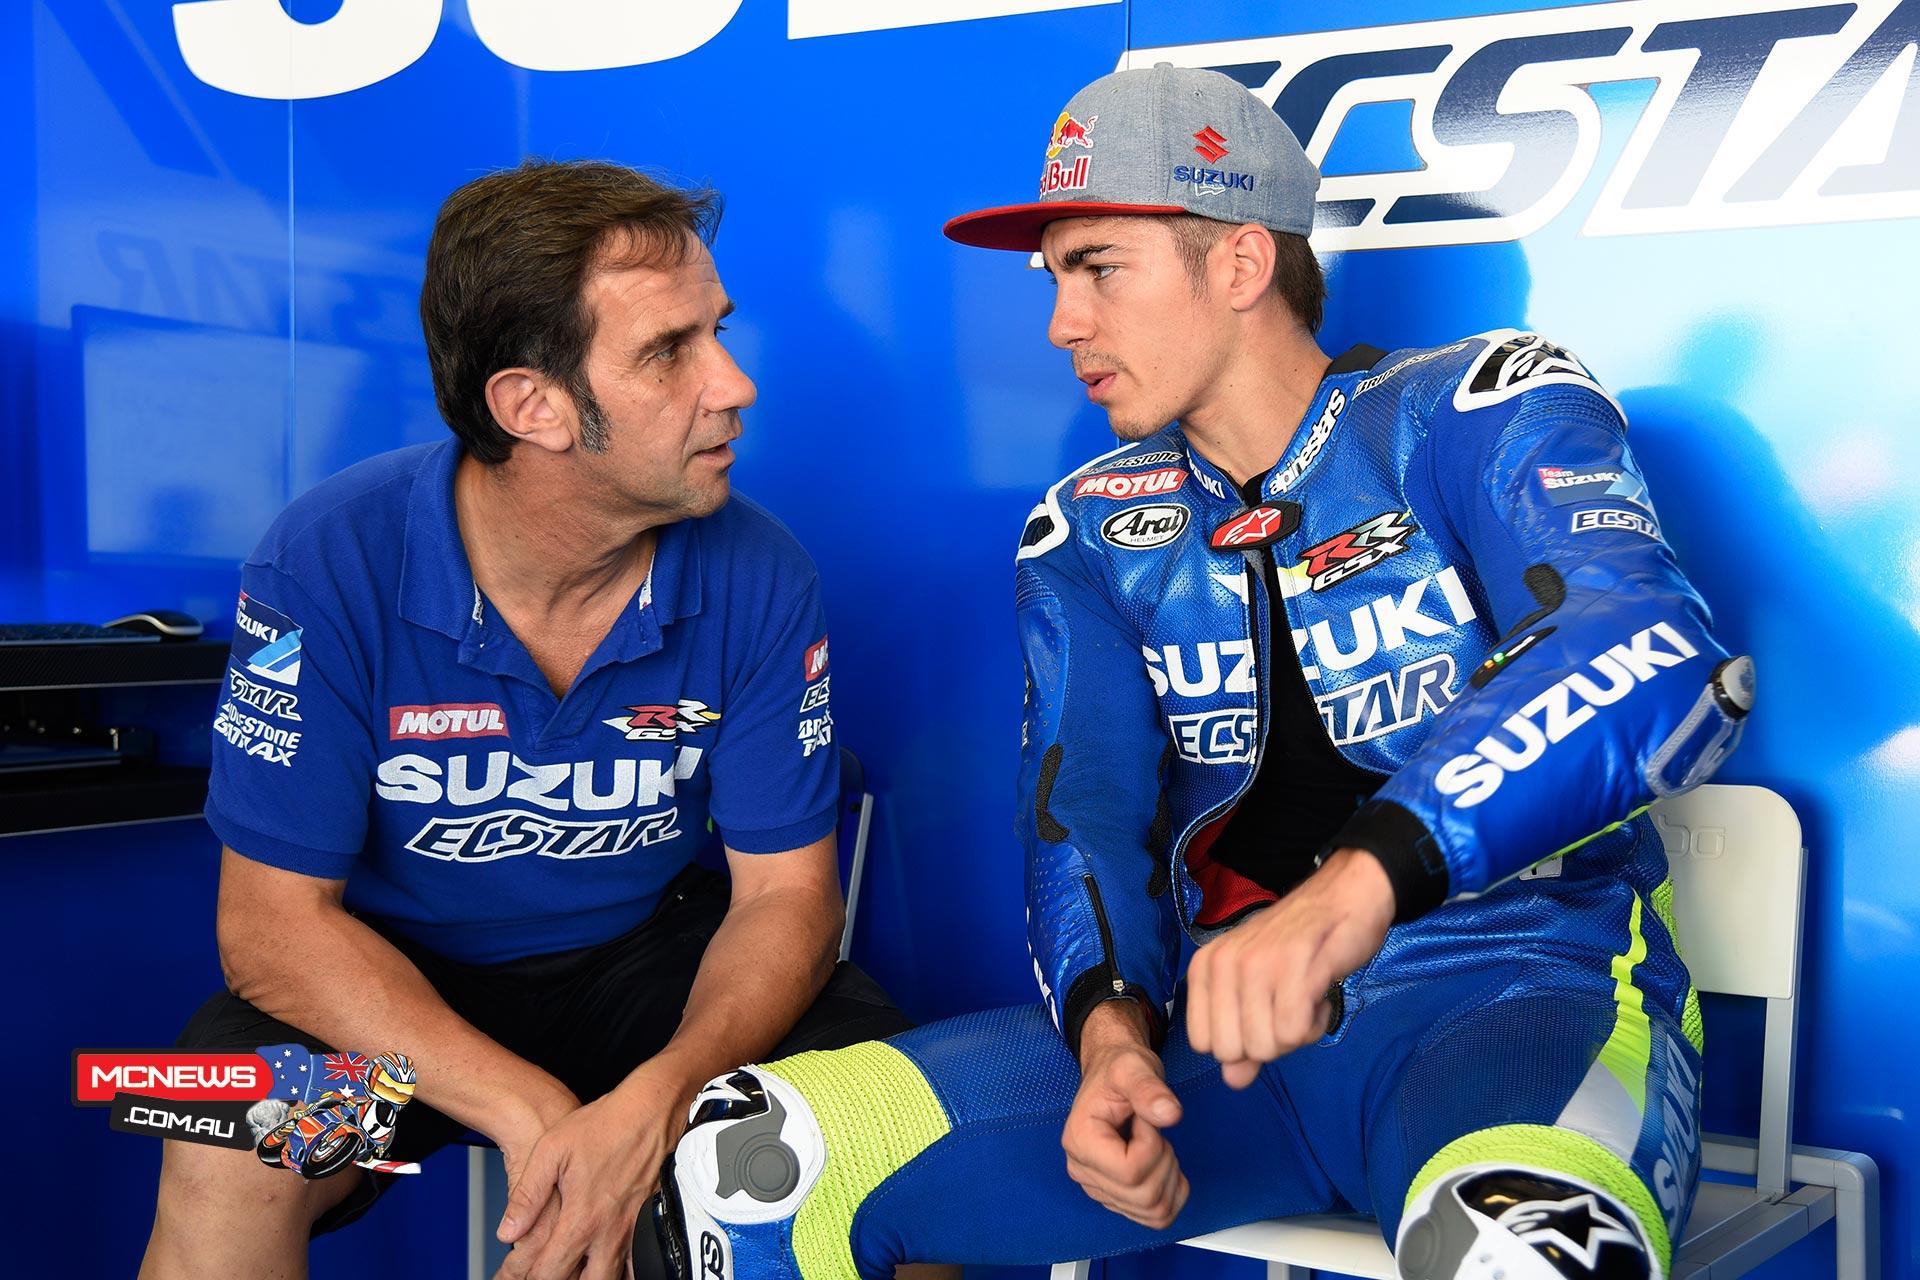 Maverick Vinales and Davide Brivio